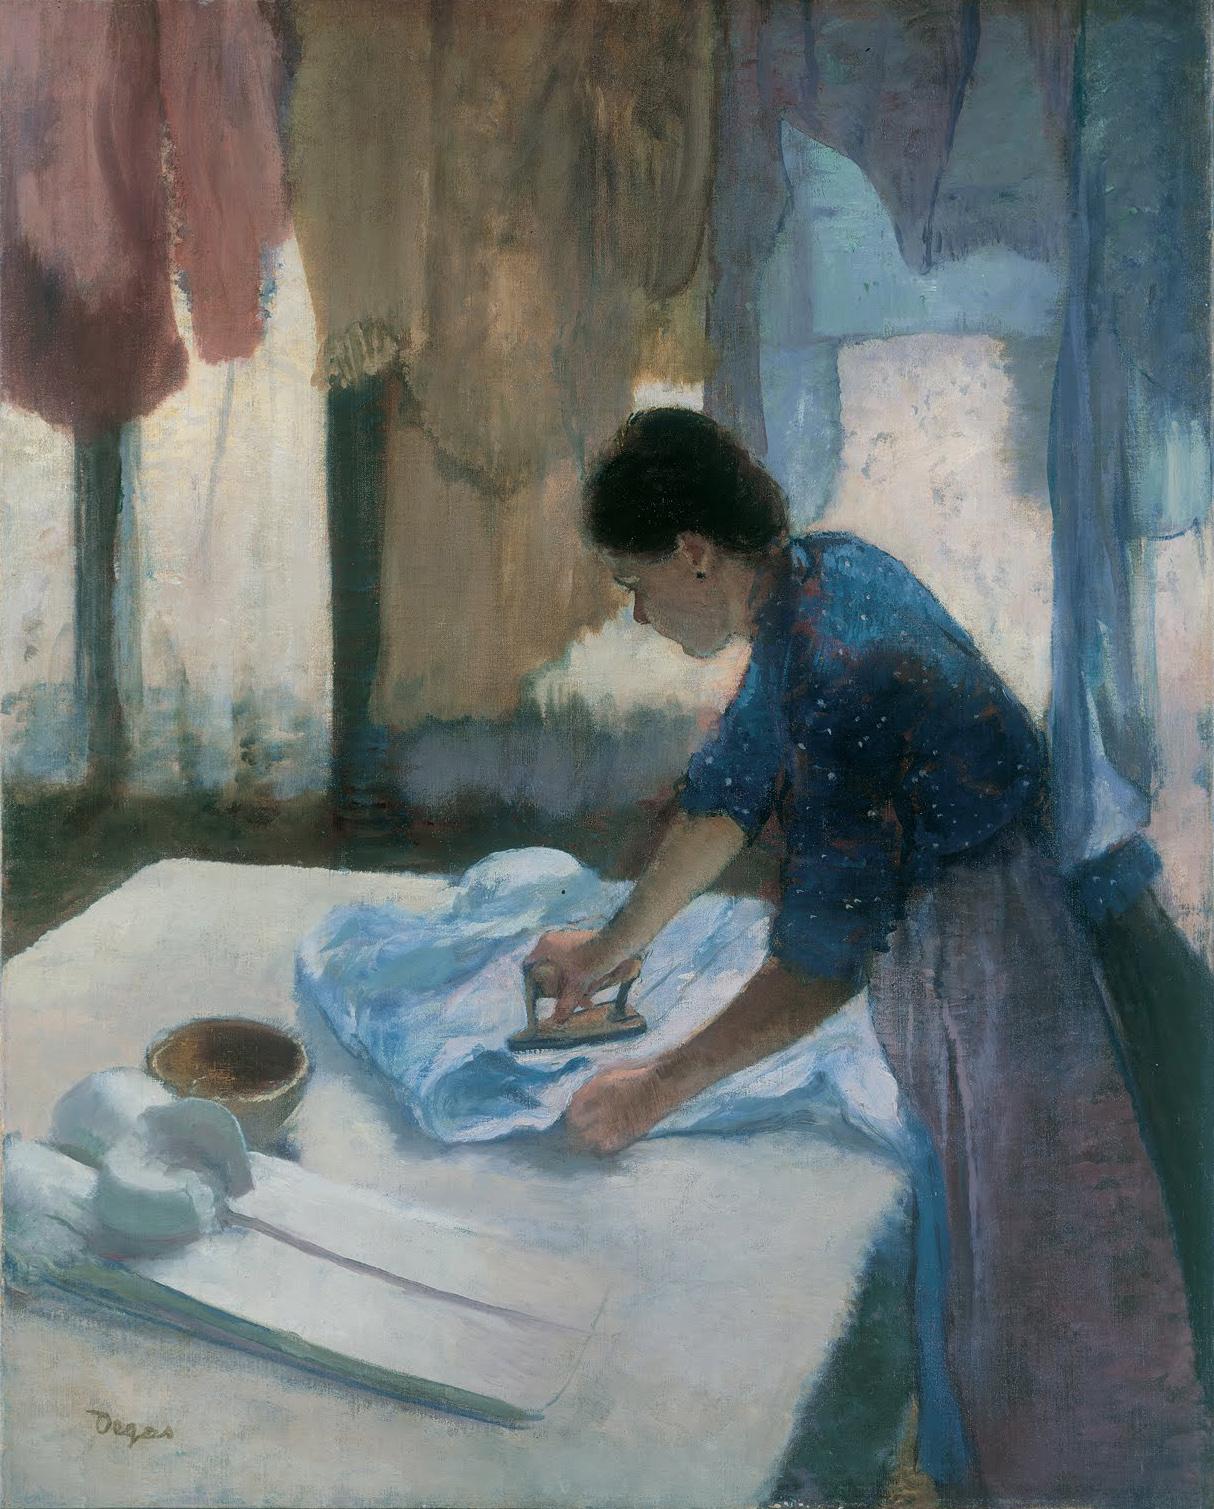 10. Mujer planchando